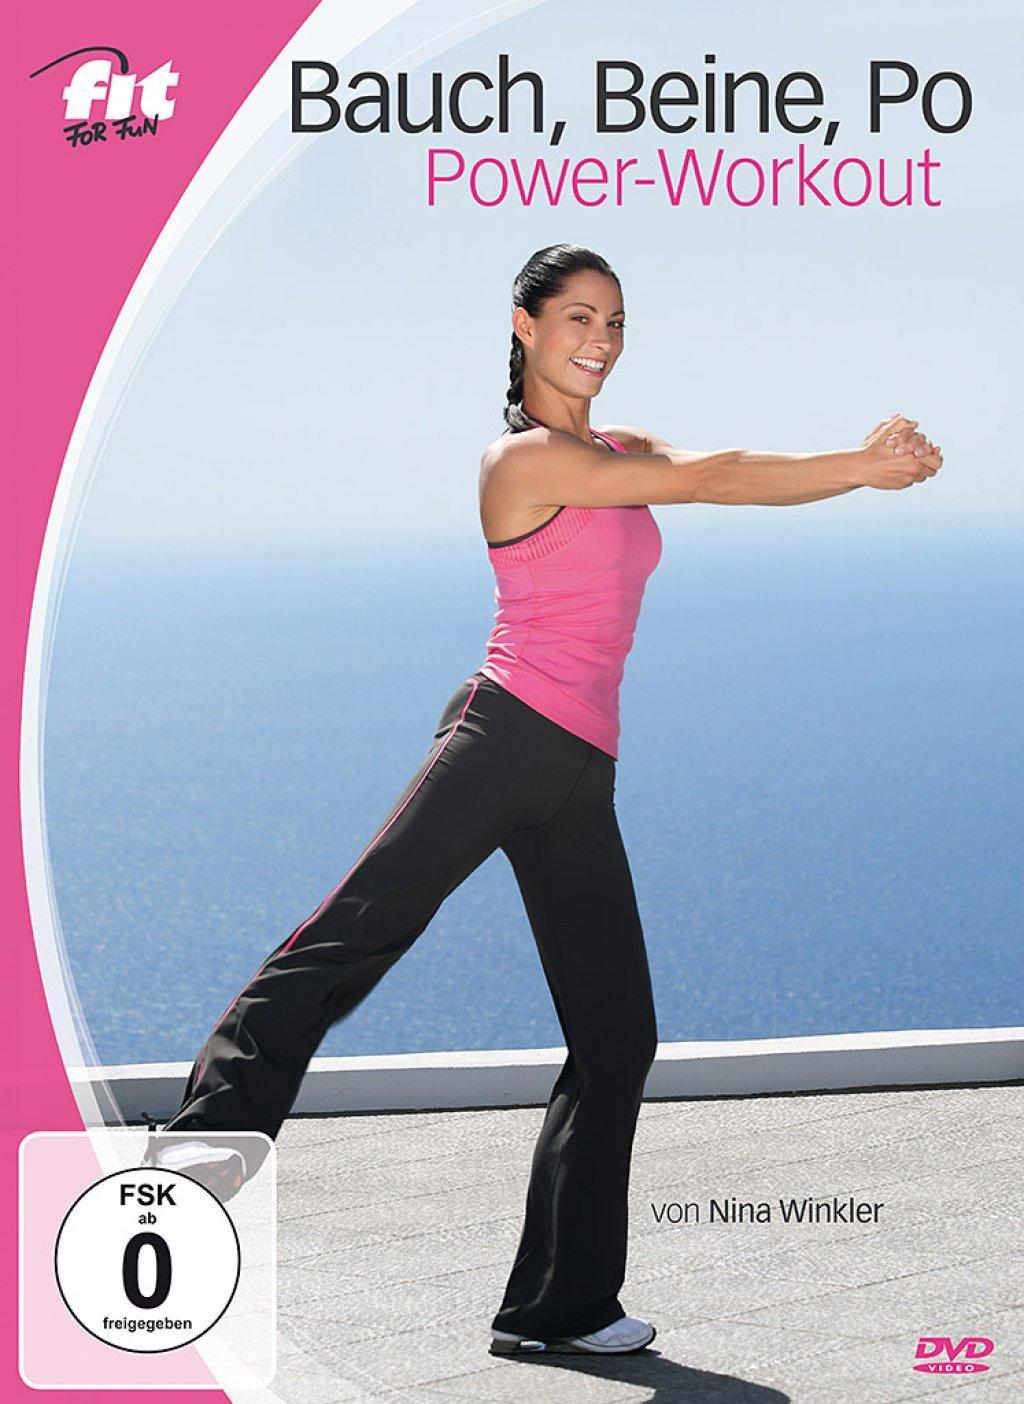 Fit for Fun - Bauch, Beine, Po Power-Workout (DVD)